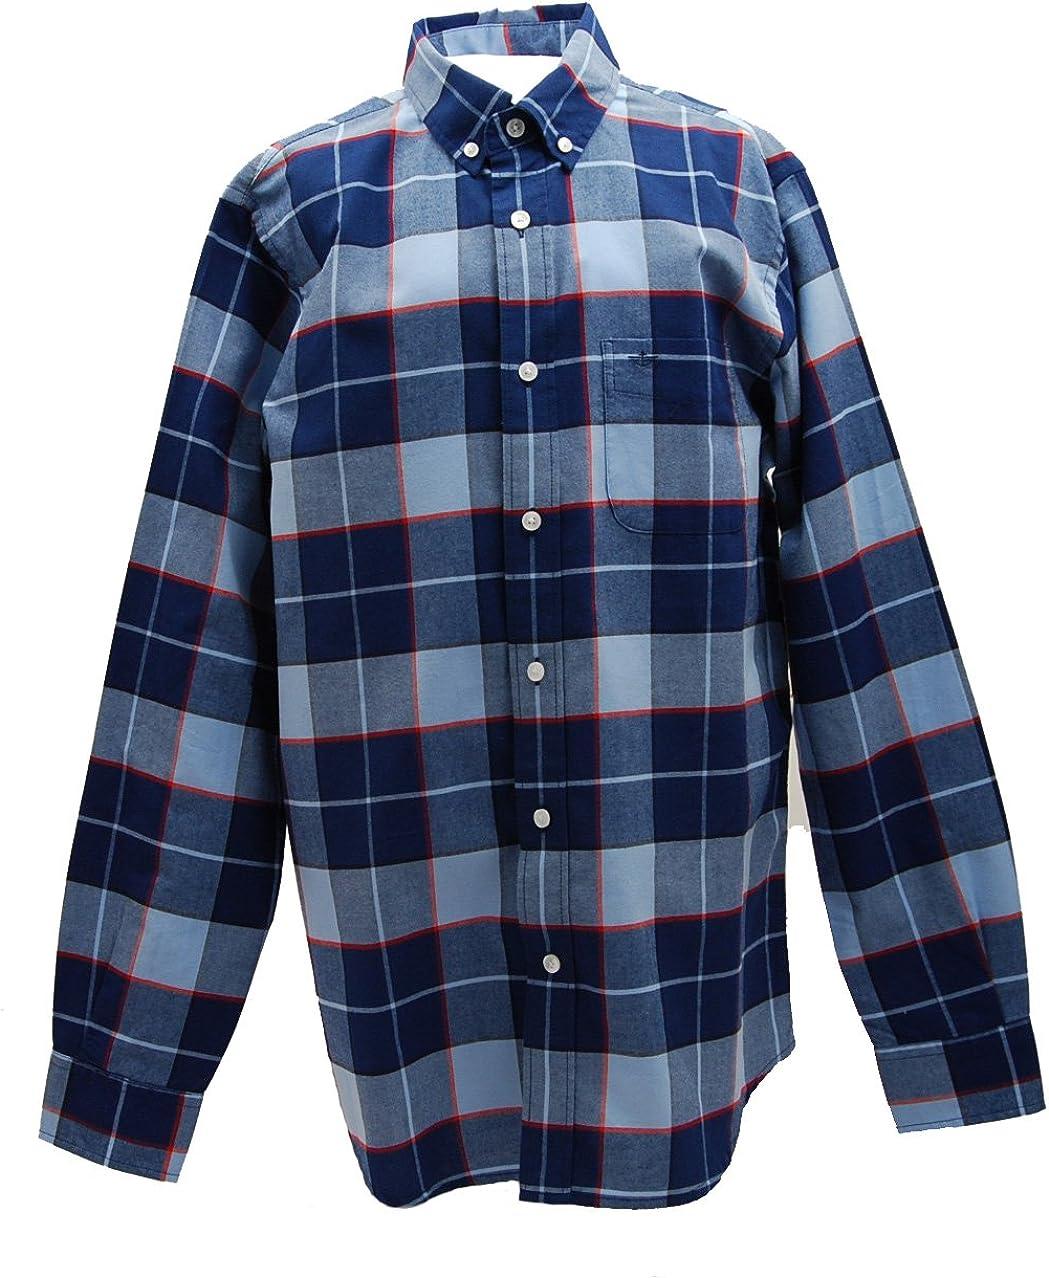 Dockers-Camisa para Hombre